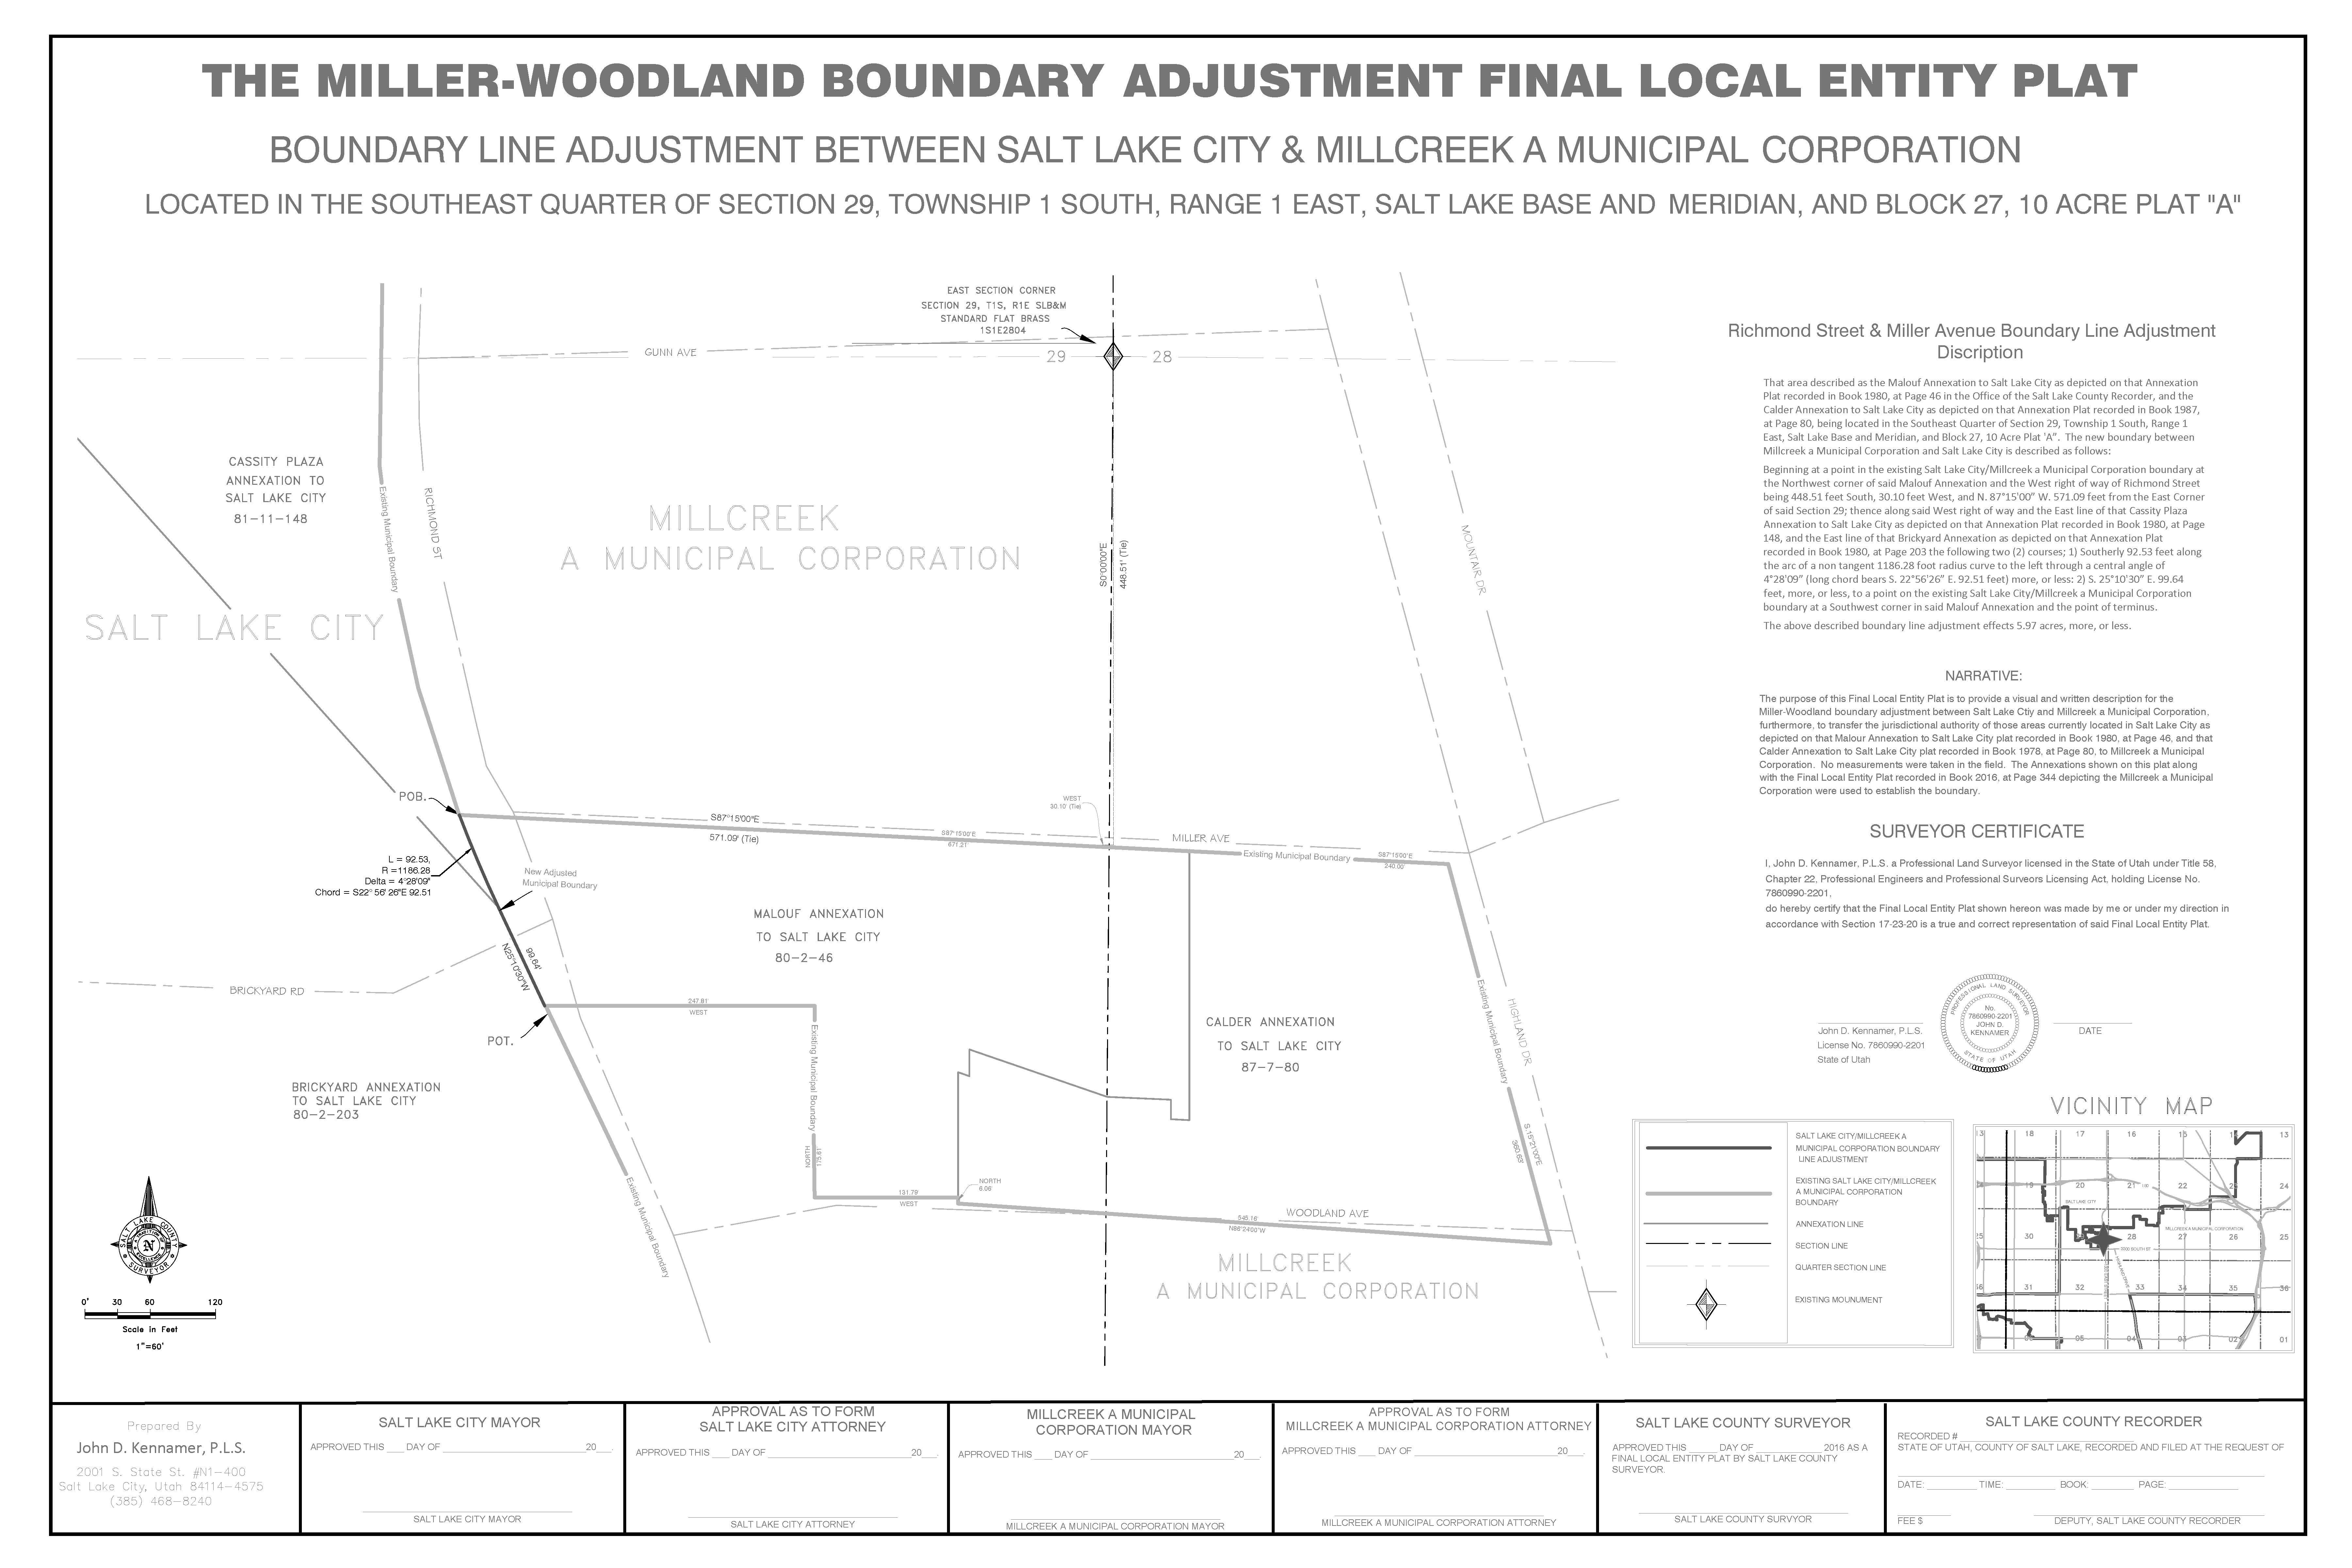 Draft Plat map for Miller, Woodland boundary adjustment